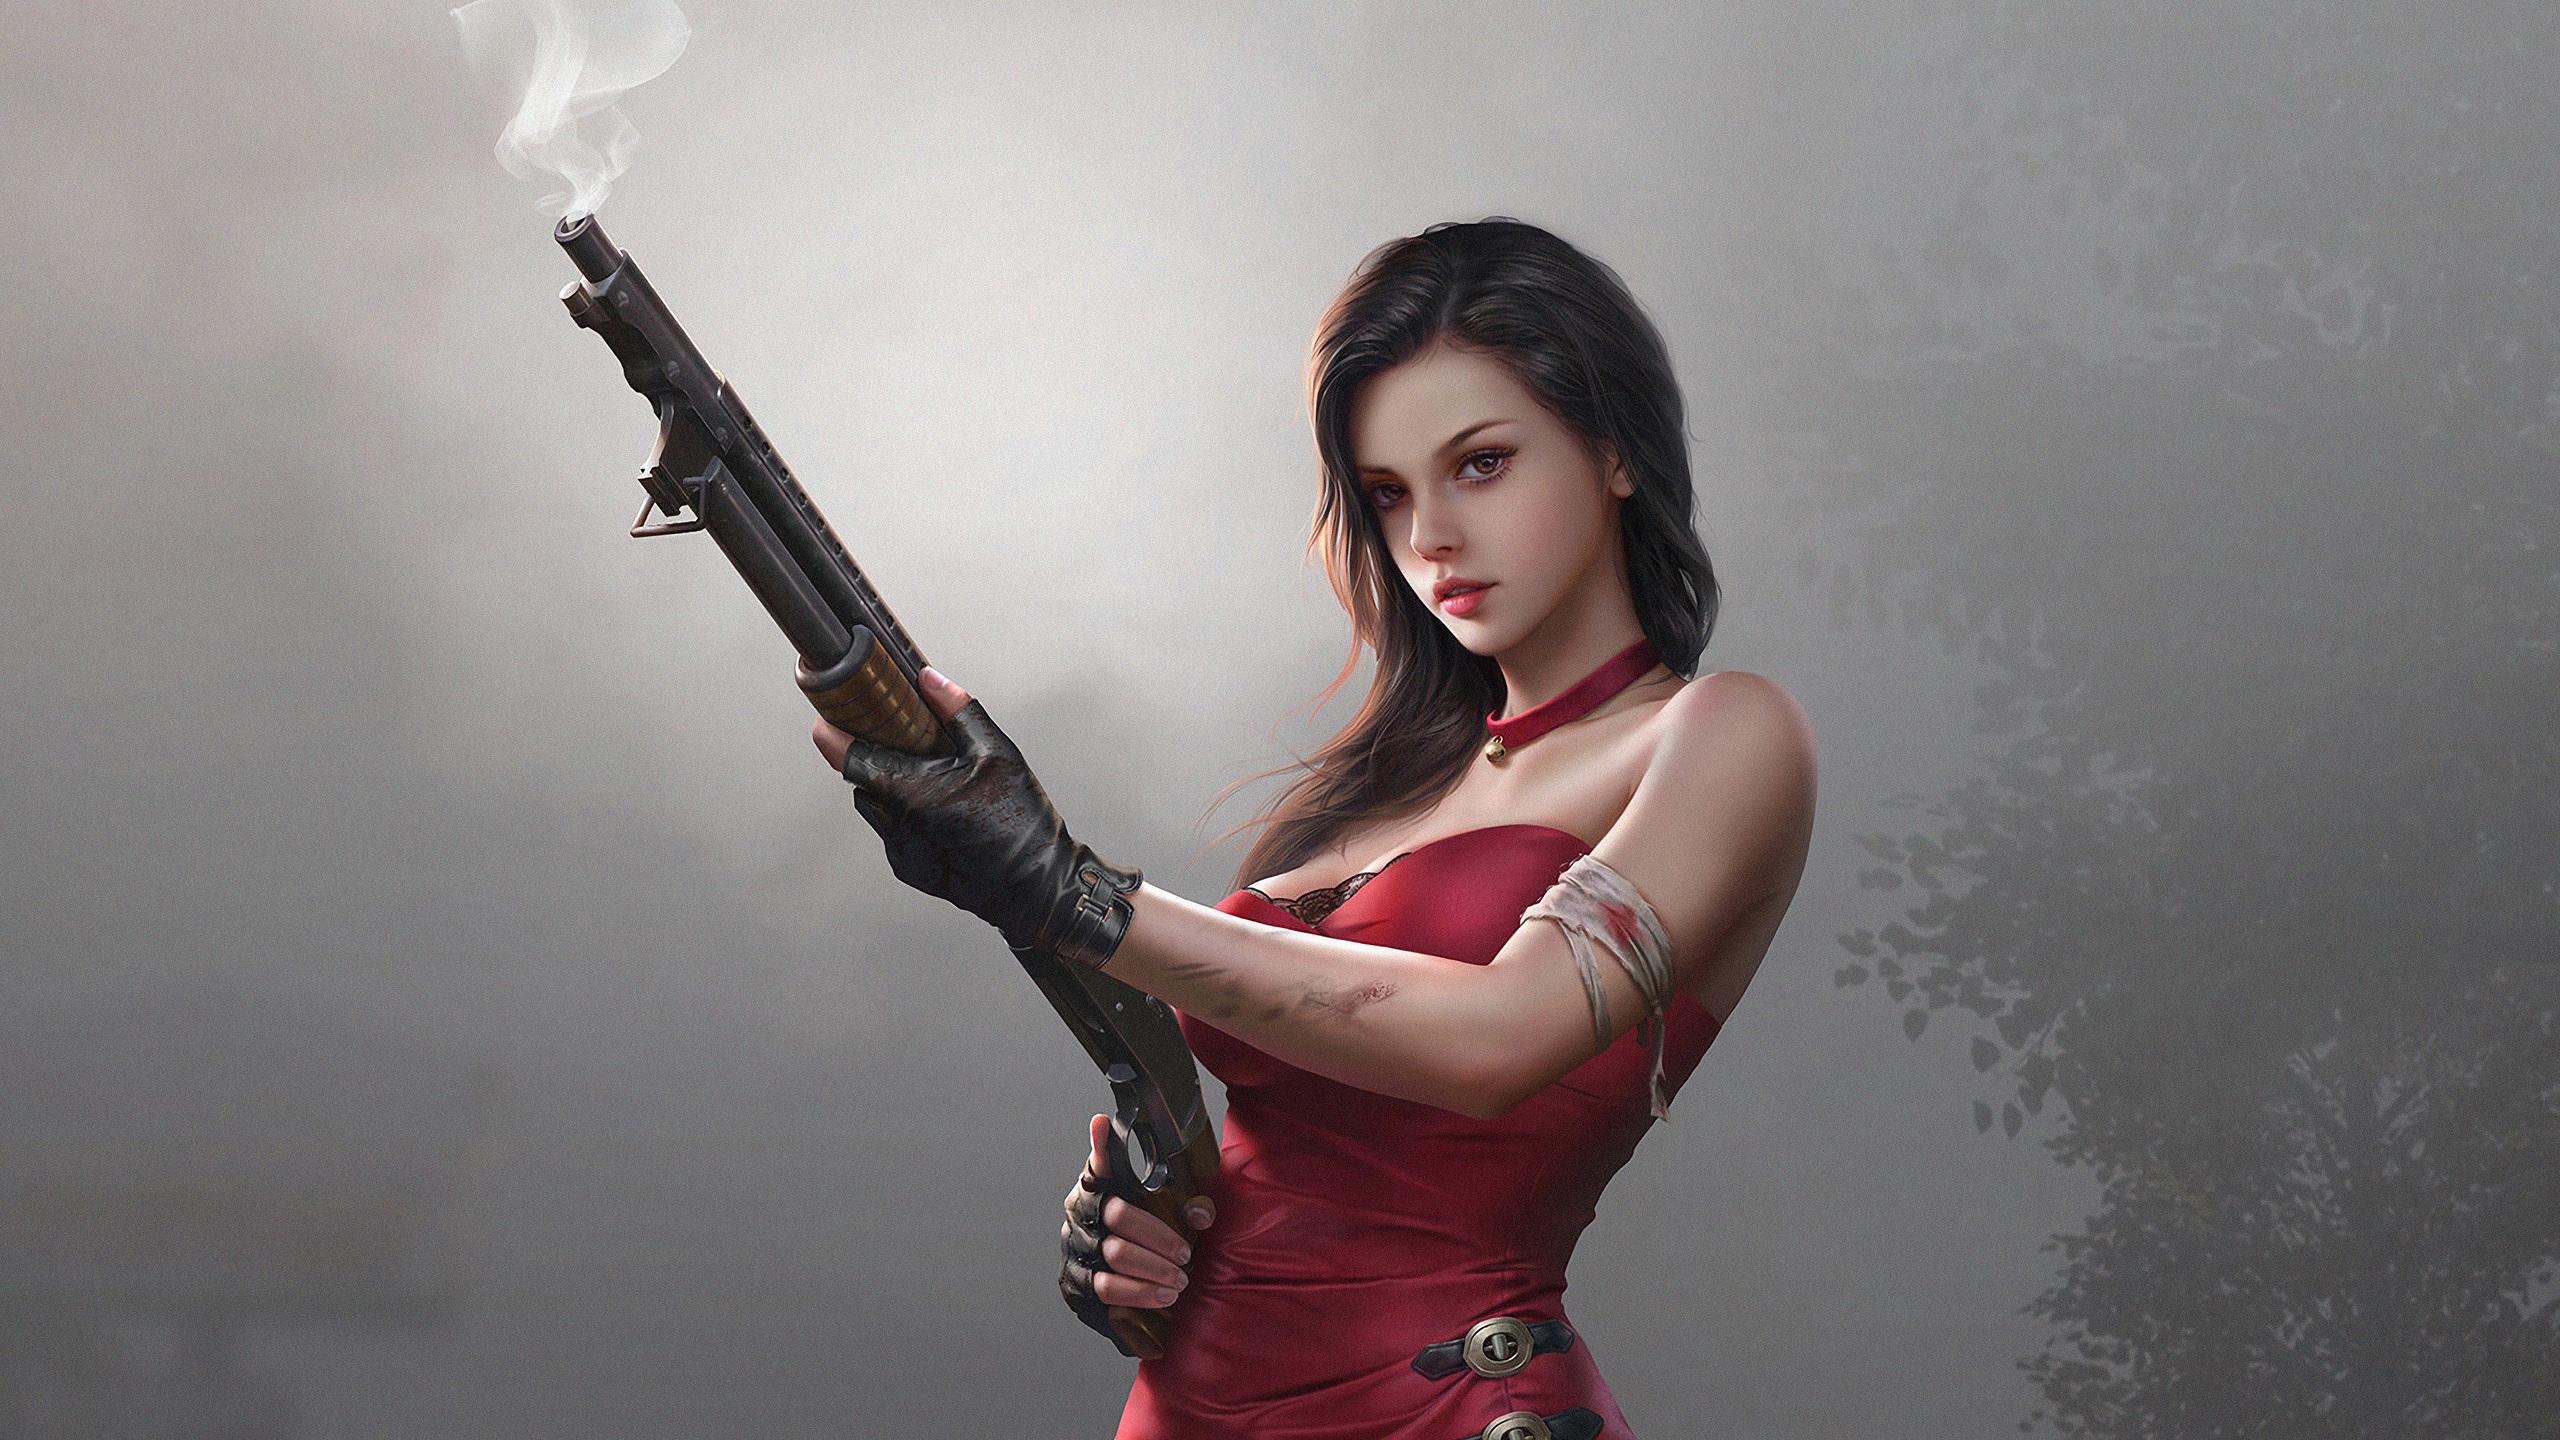 General 2560x1440 fantasy girl gun red dress girls with guns ada wong